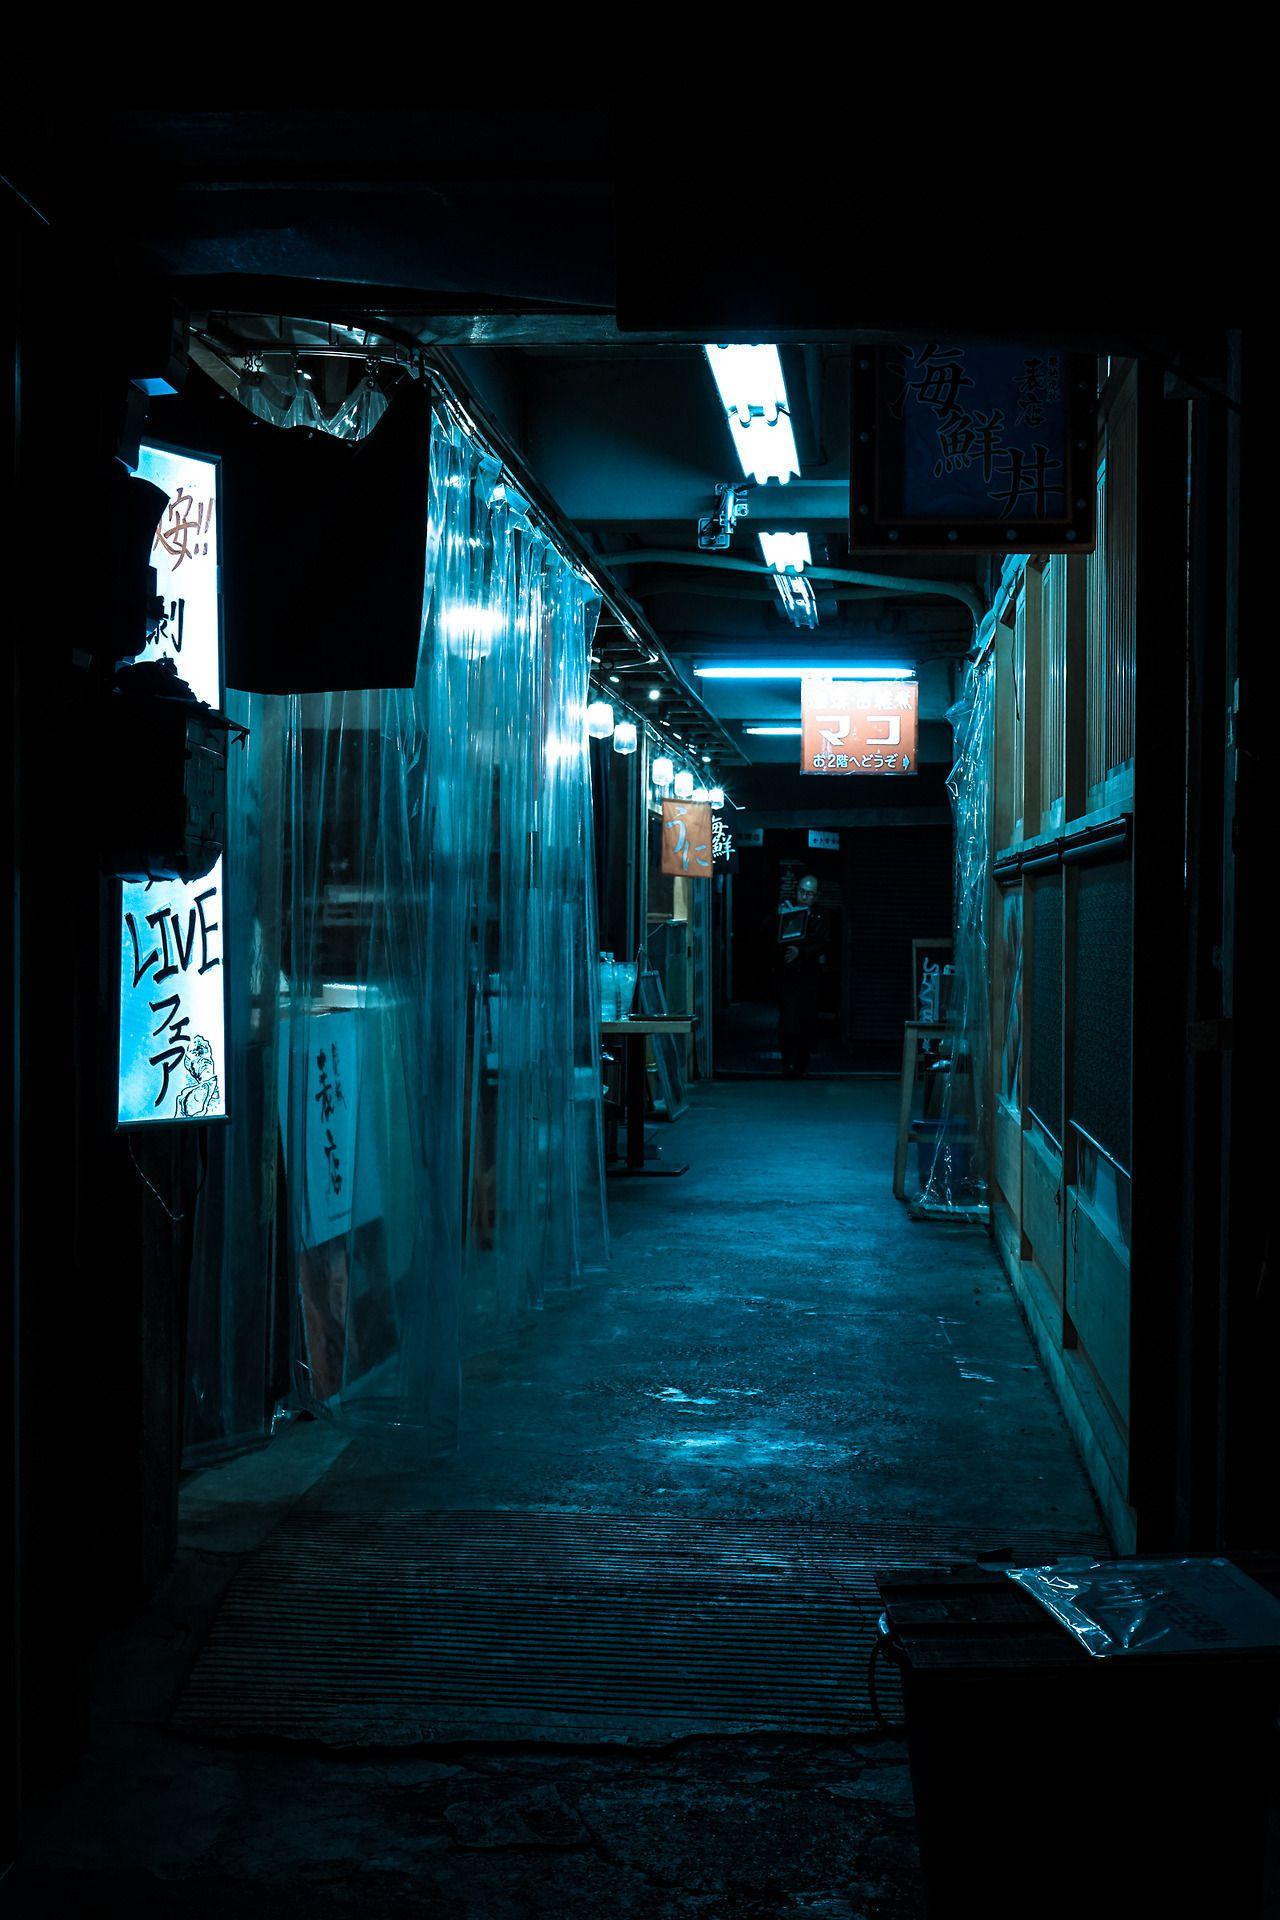 Bitpunk Tokyo Logocore Blurred Background Photography Cinematic Photography Dark Street